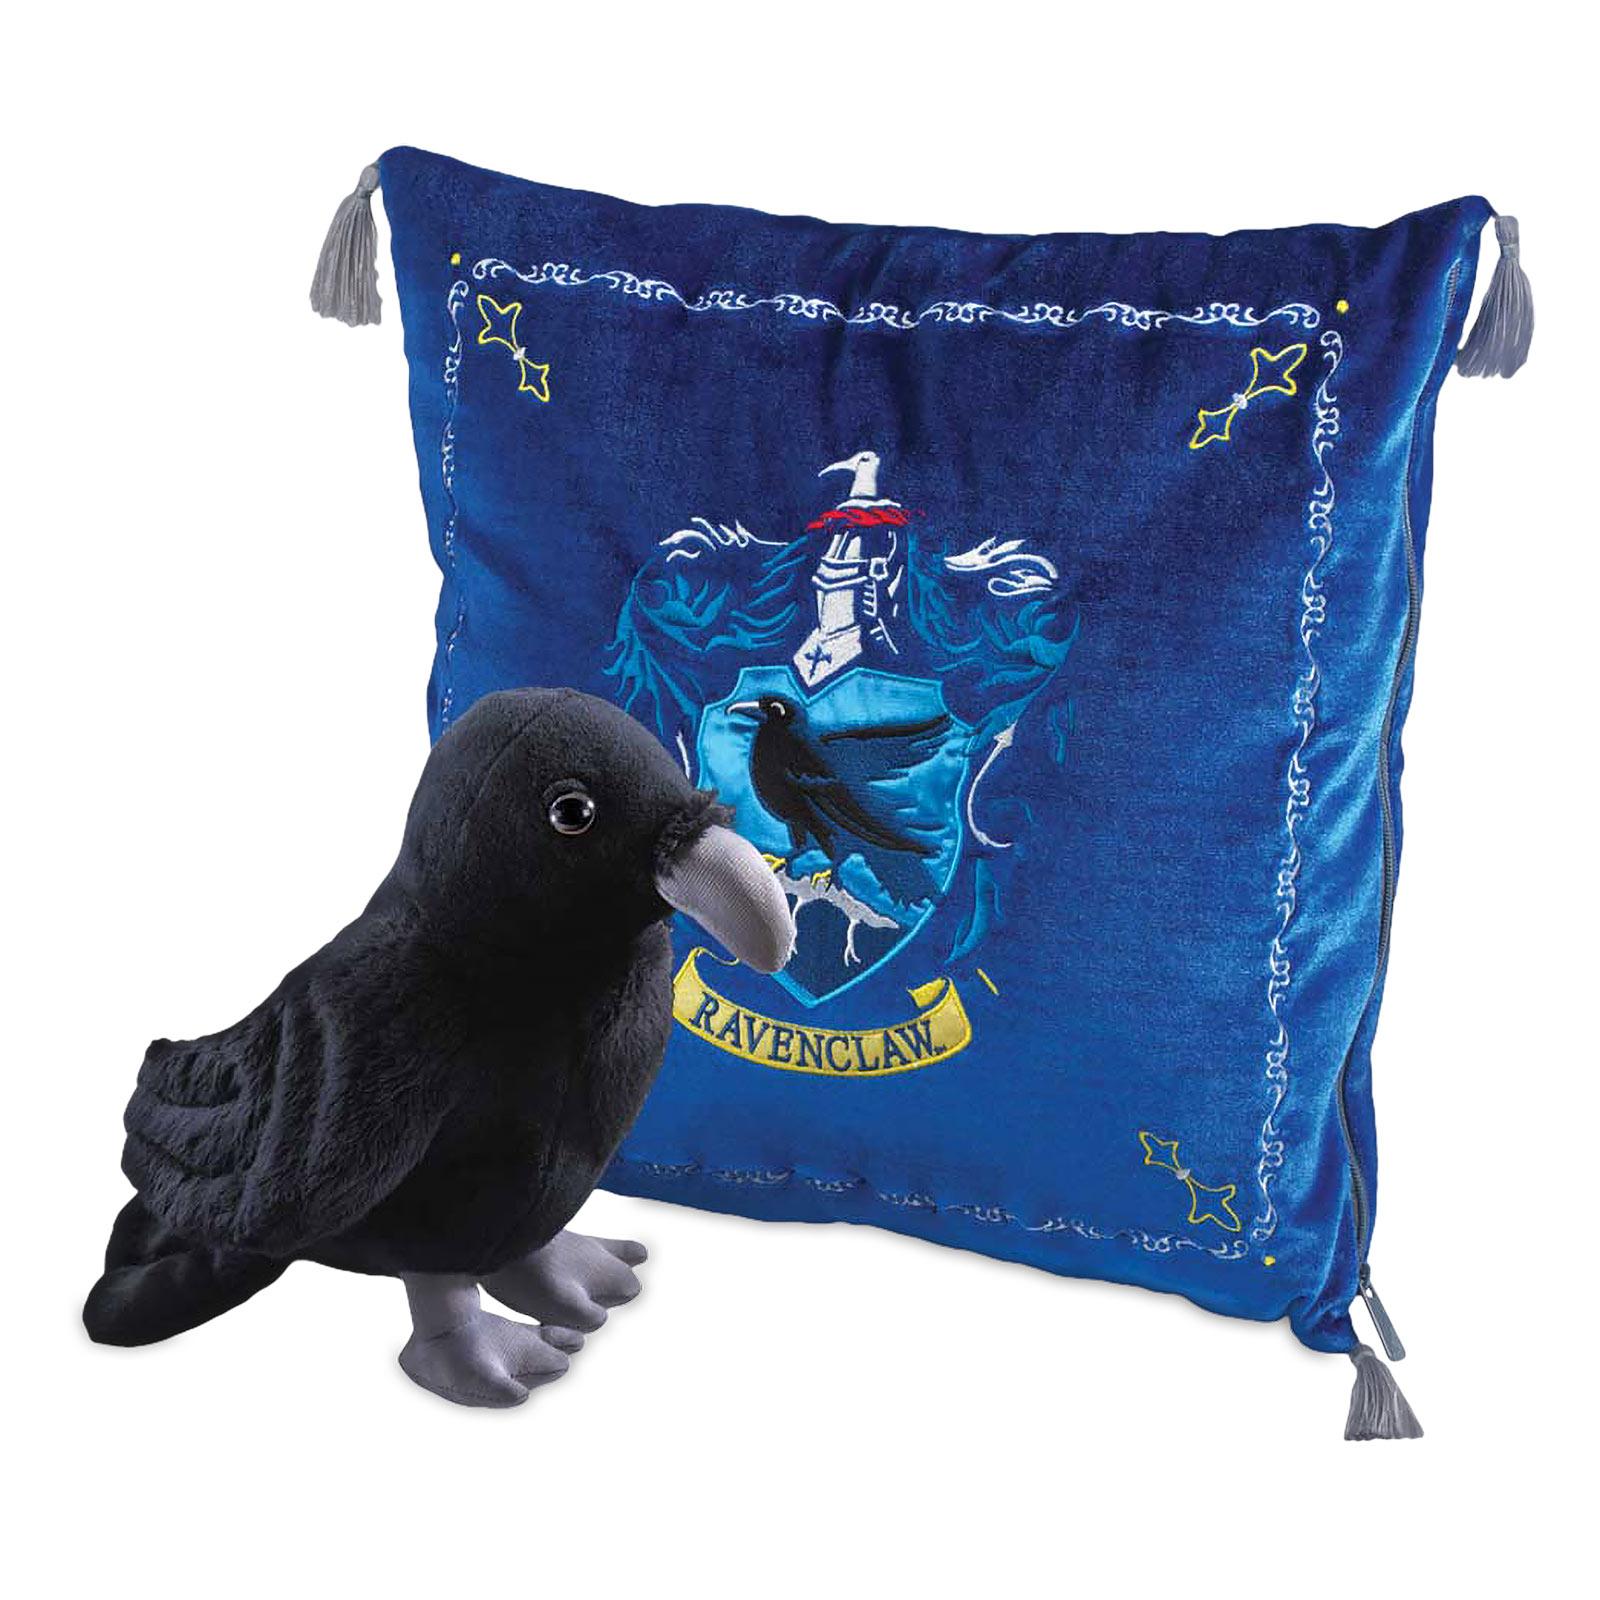 Harry Potter - Ravenclaw Wappen Kissen mit Plüsch Figur